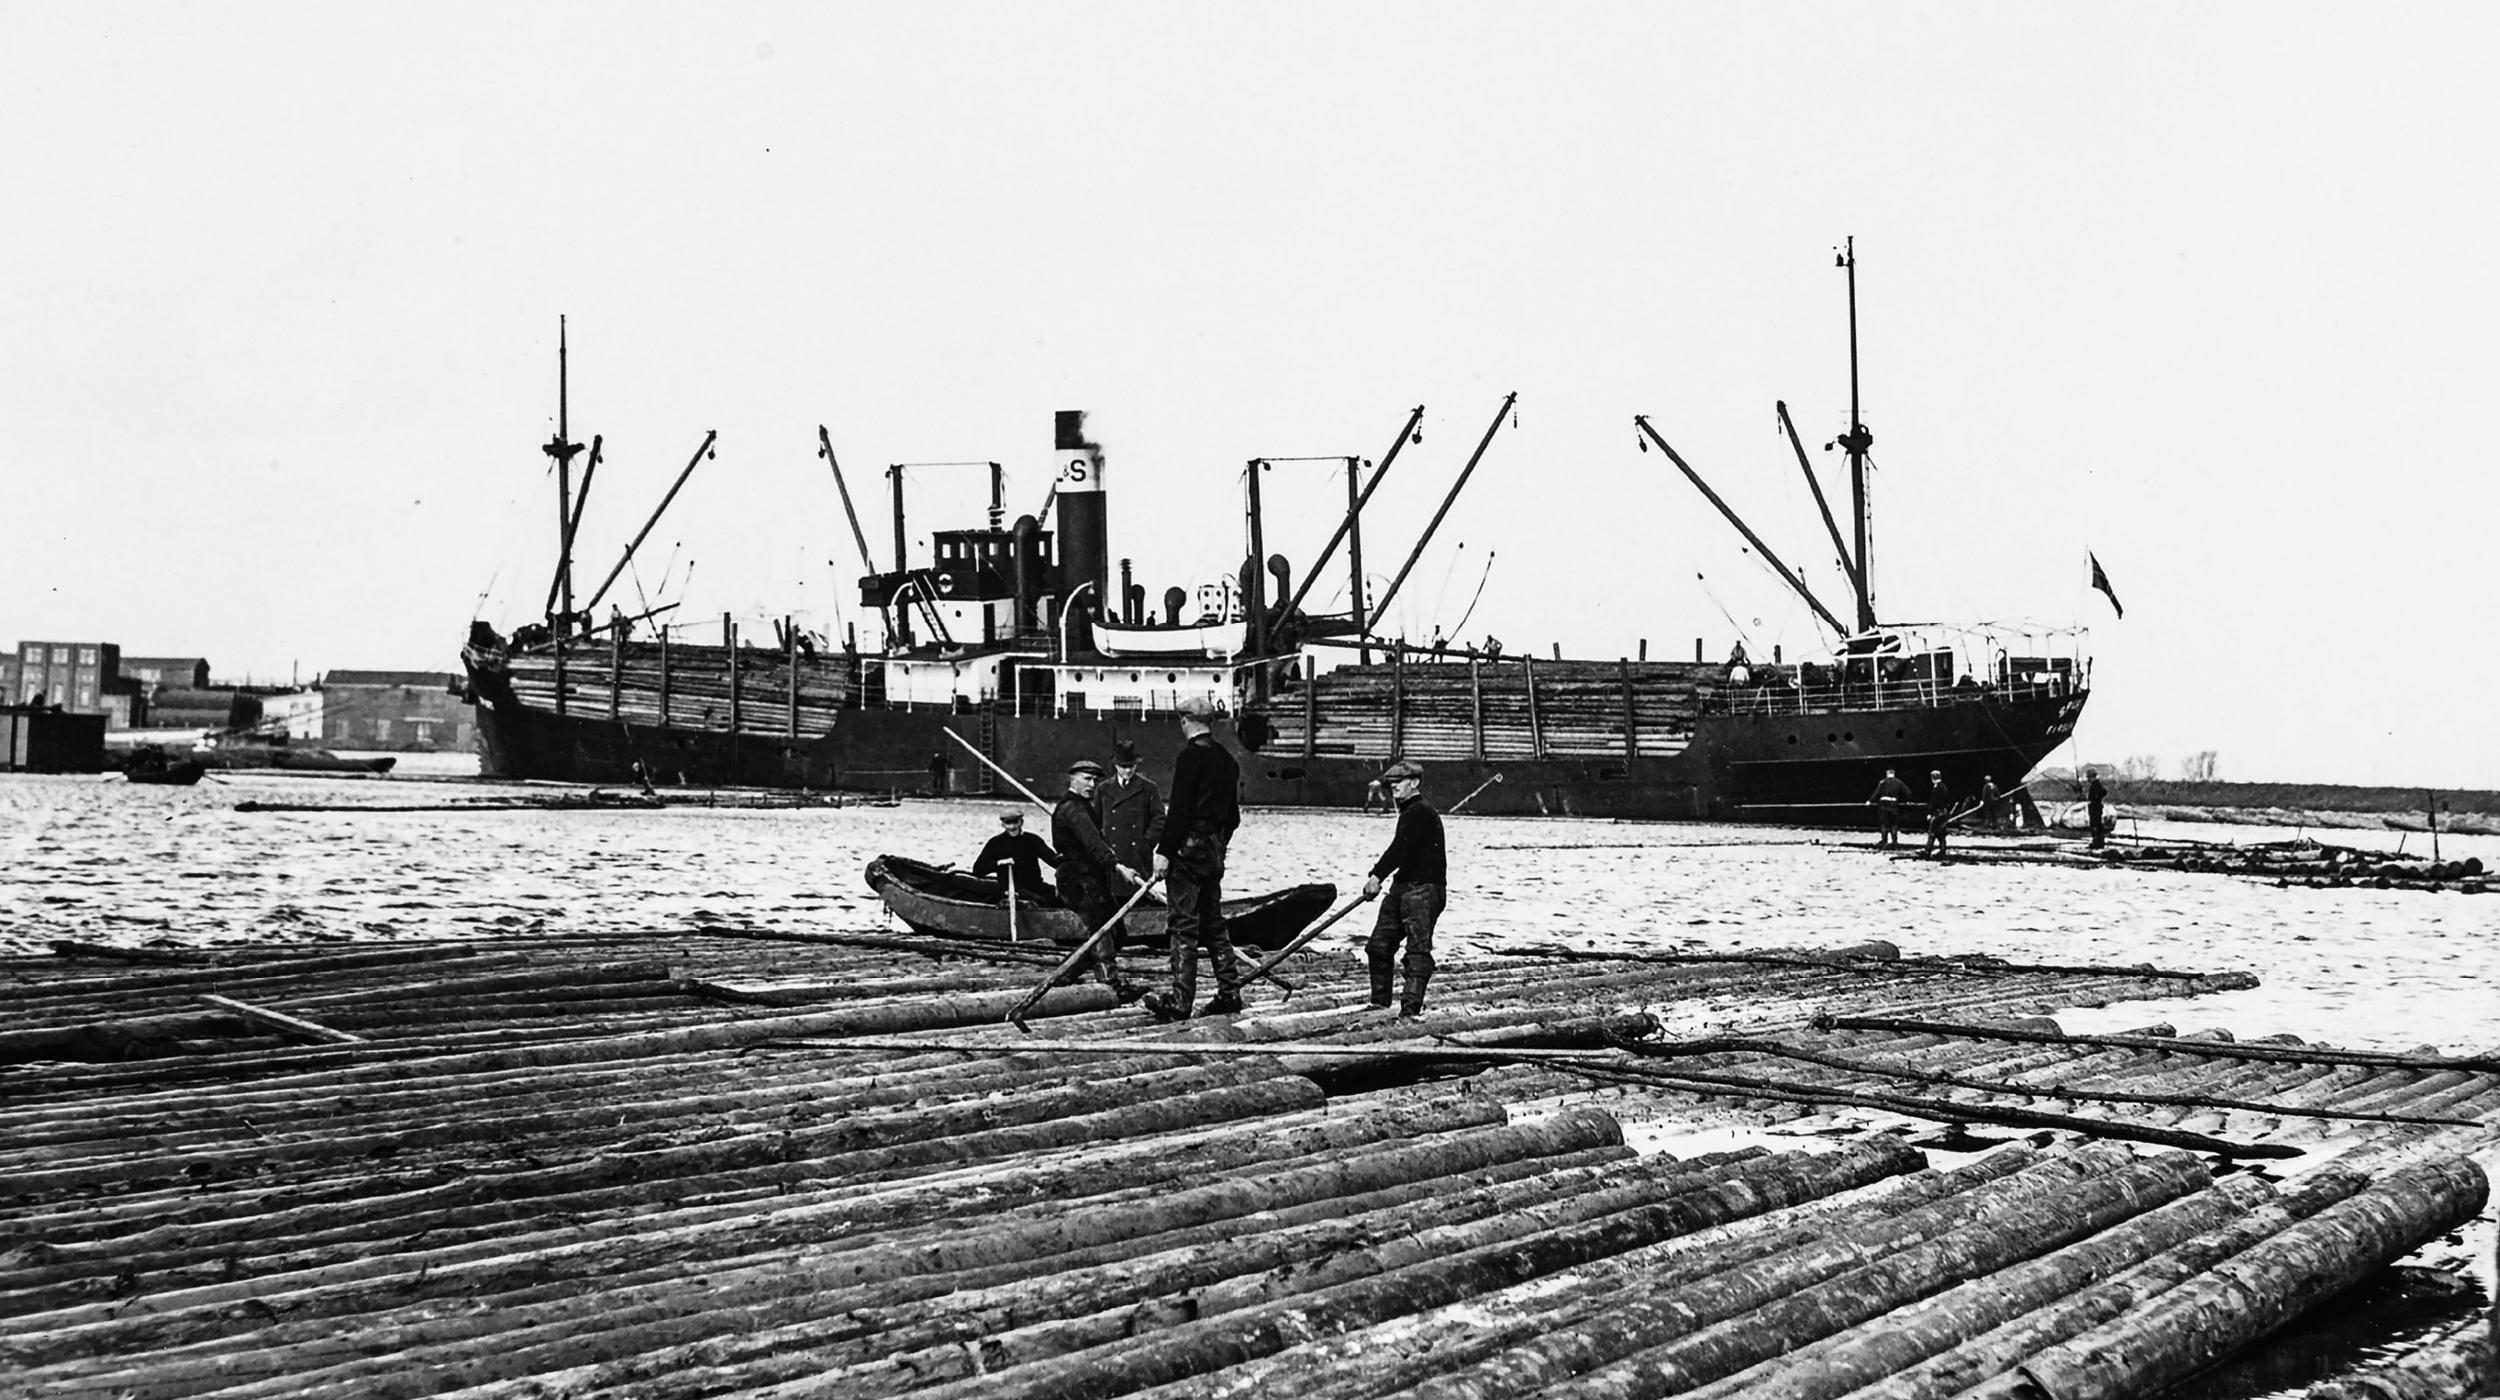 Pontsteiger houthavens Amsterdam oorspronkelijk